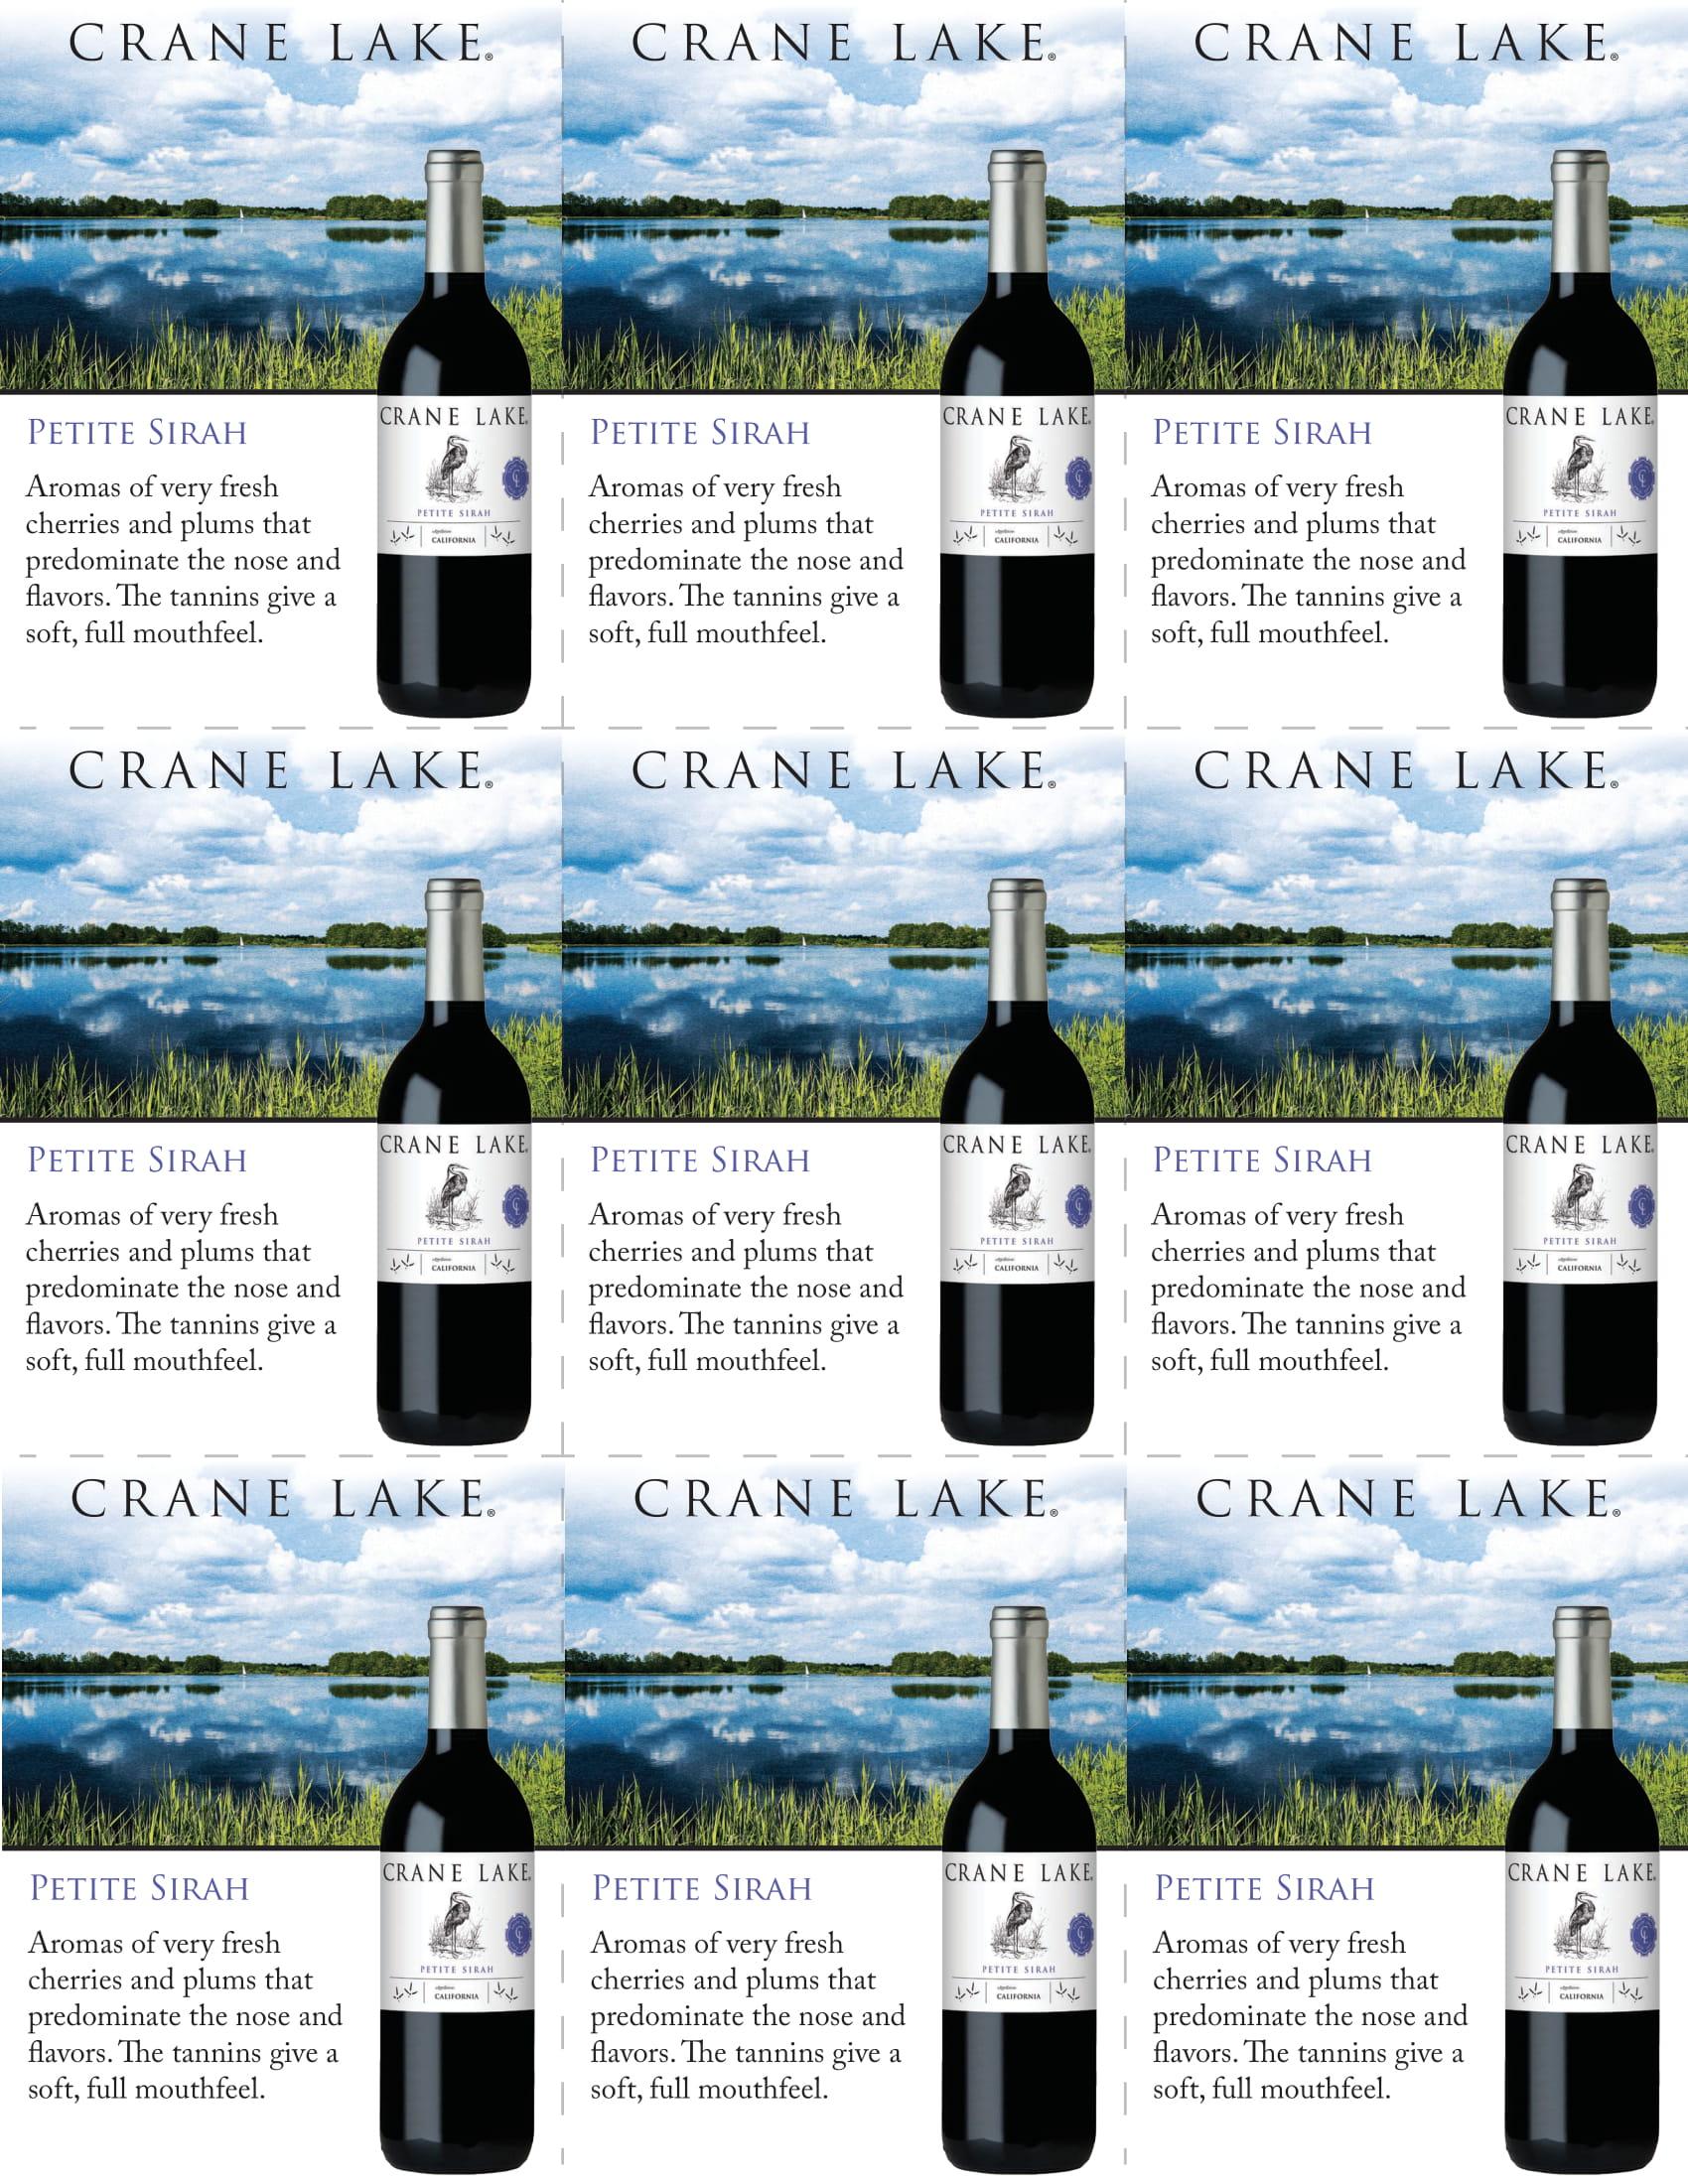 Crane Lake Petite Sirah Shelf Talkers